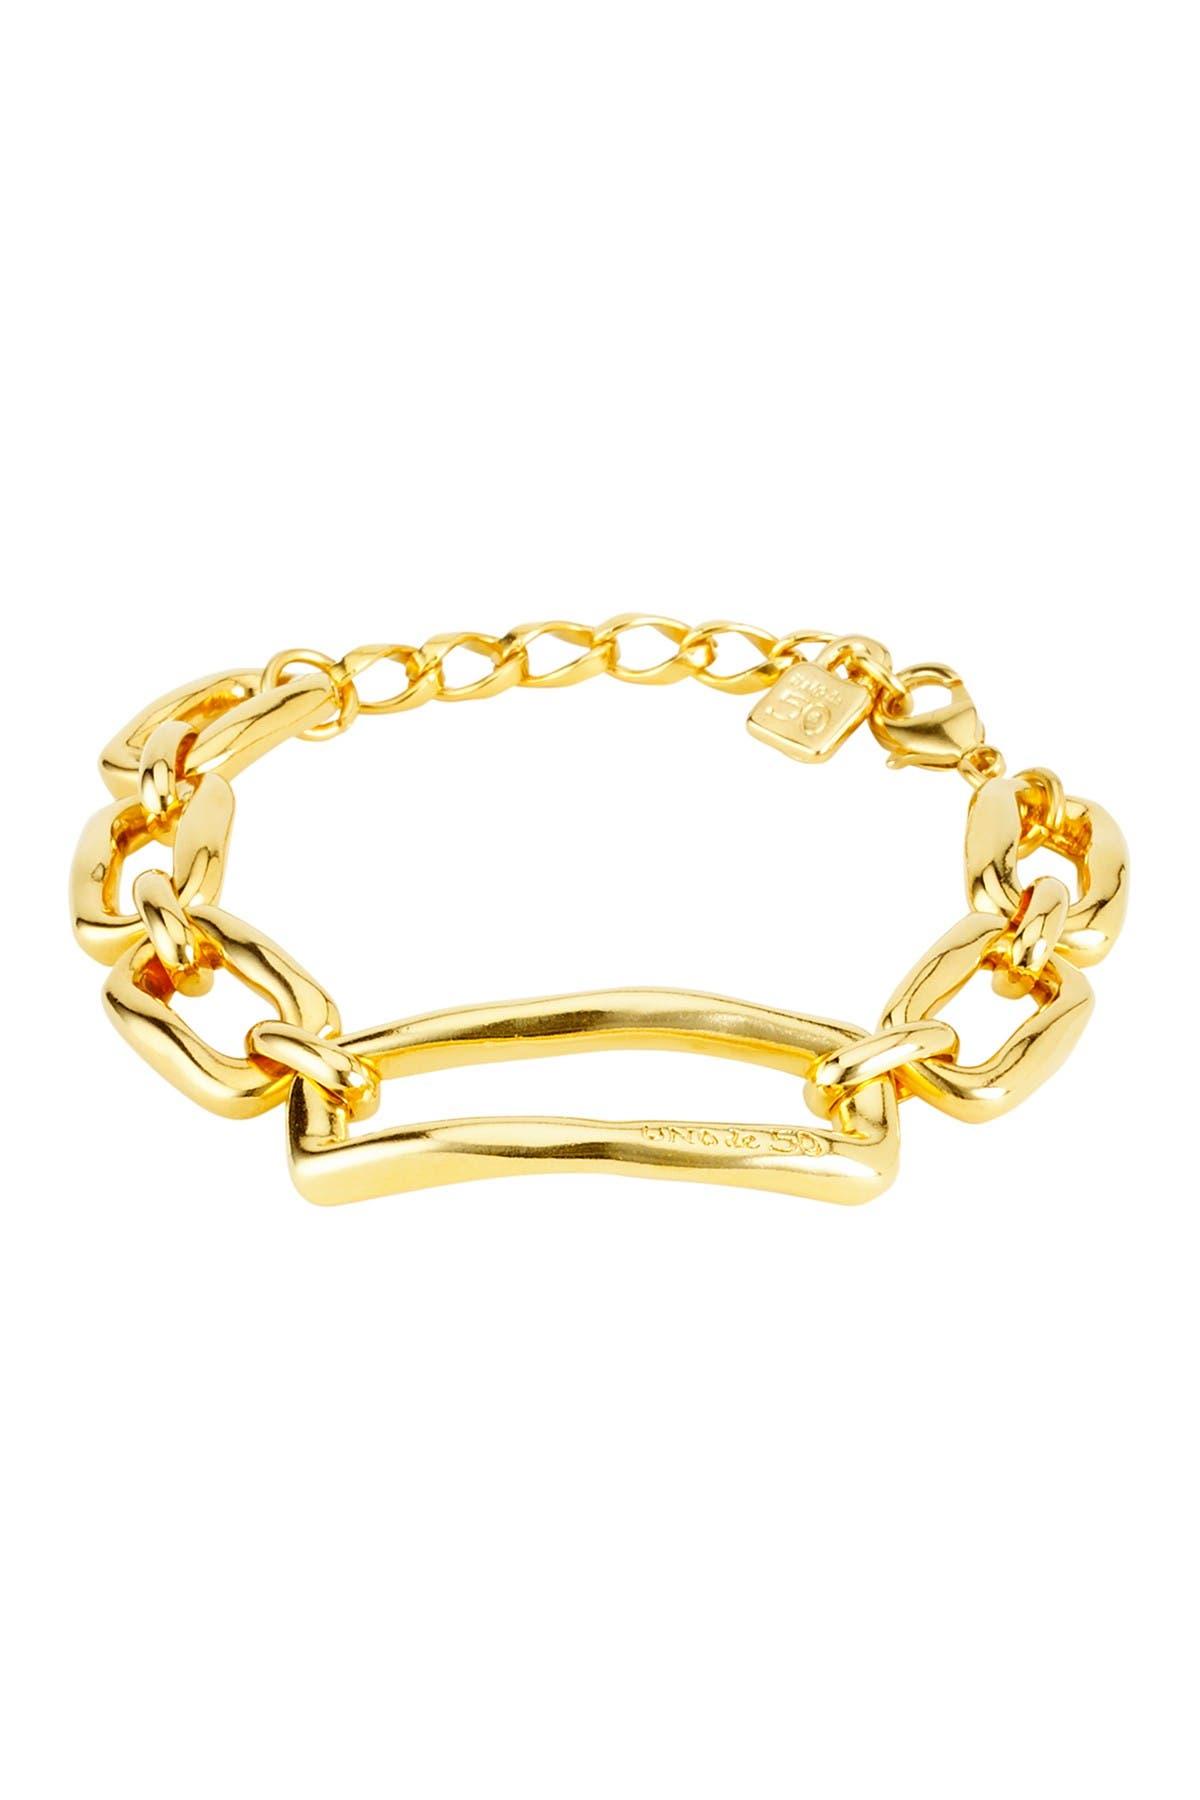 Image of Uno De 50 Chain By Chain Bracelet